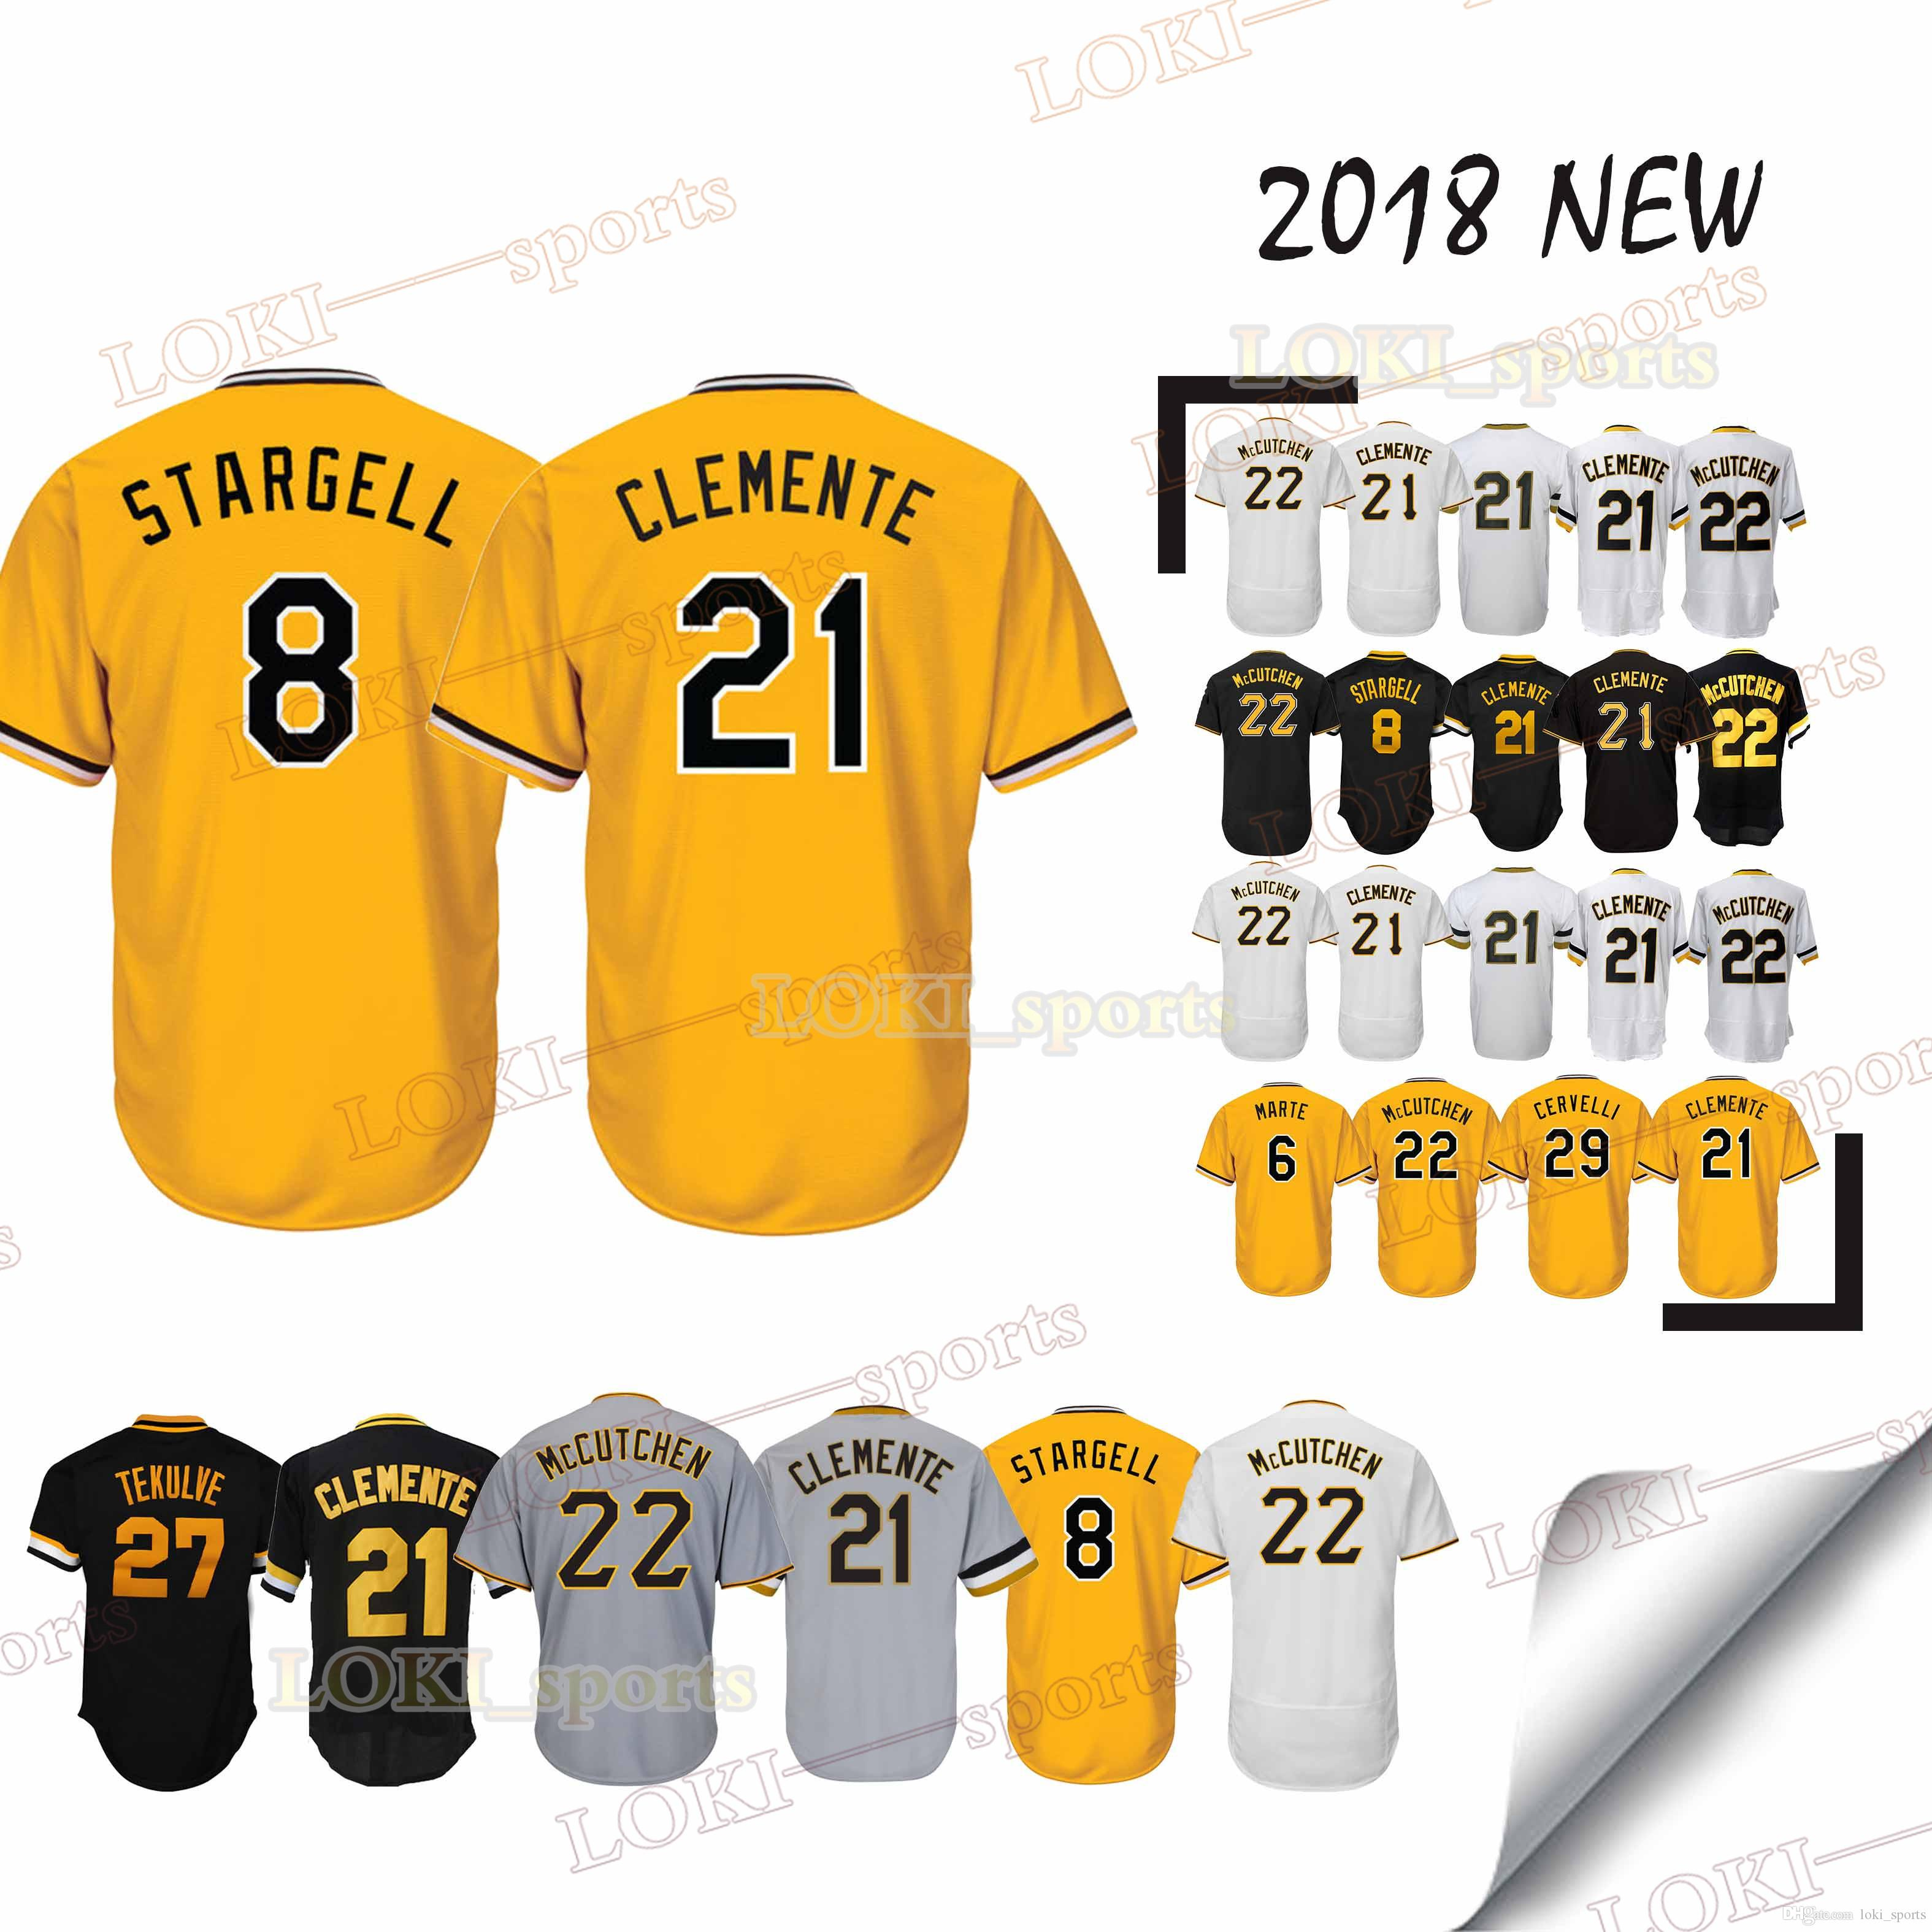 info for 7c818 e6625 Pittsburgh Pirates jerseys 8 Stargell Majestic 21 Roberto Clemente 29  Francisco Cervelli 6 Starling Marte 27 Kent Tekulve jersey sportswear